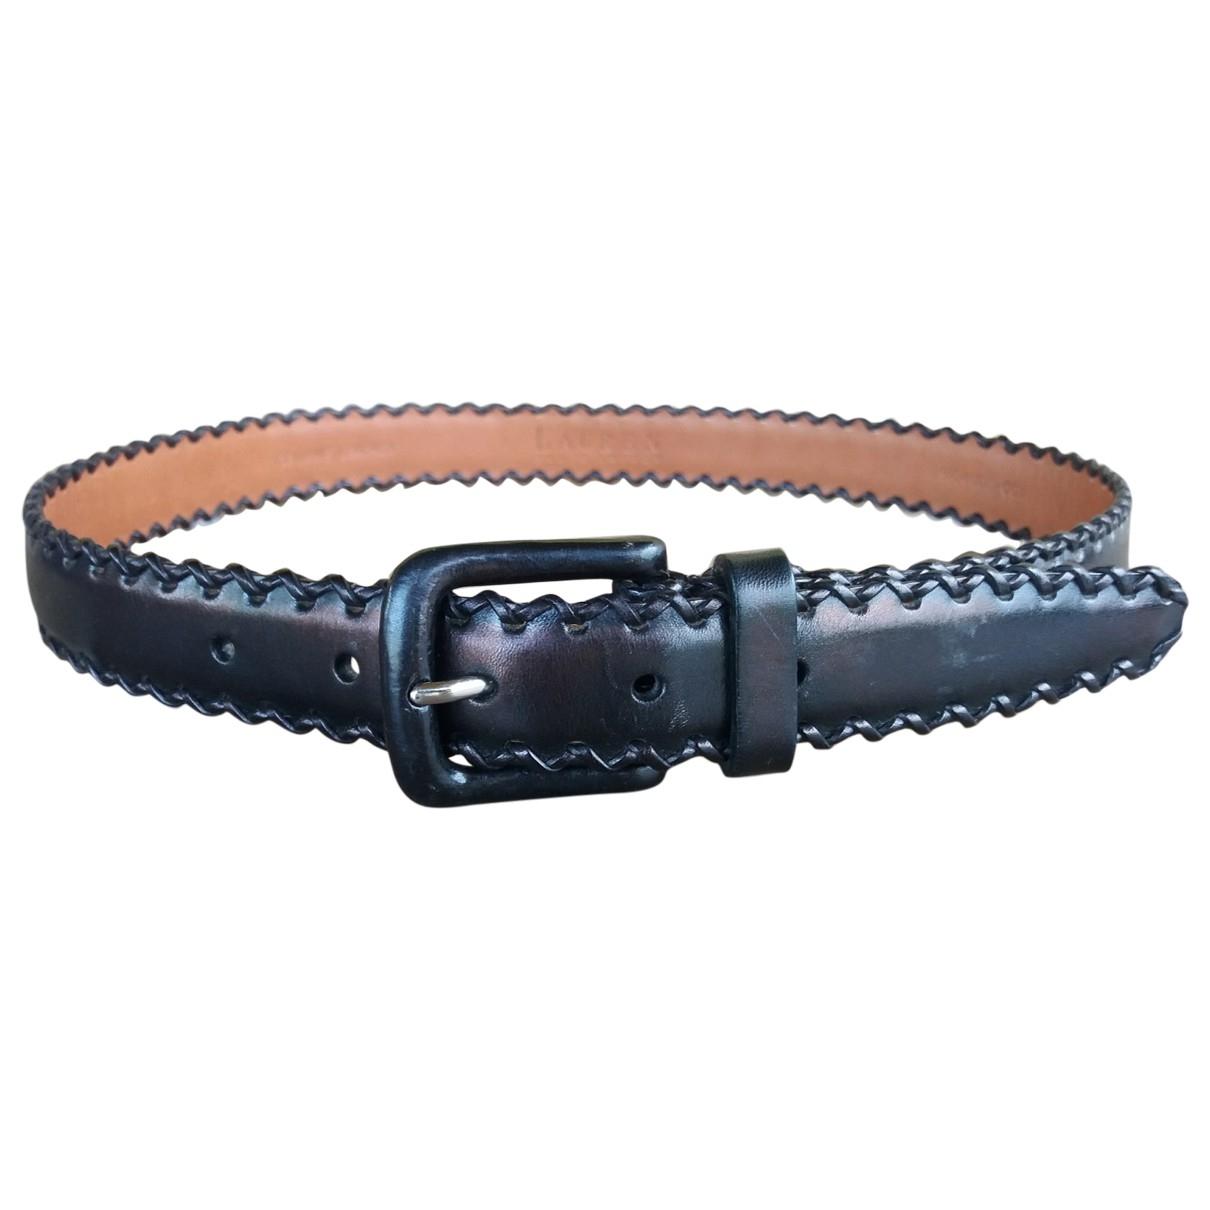 Lauren Ralph Lauren \N Black Leather belt for Women M International